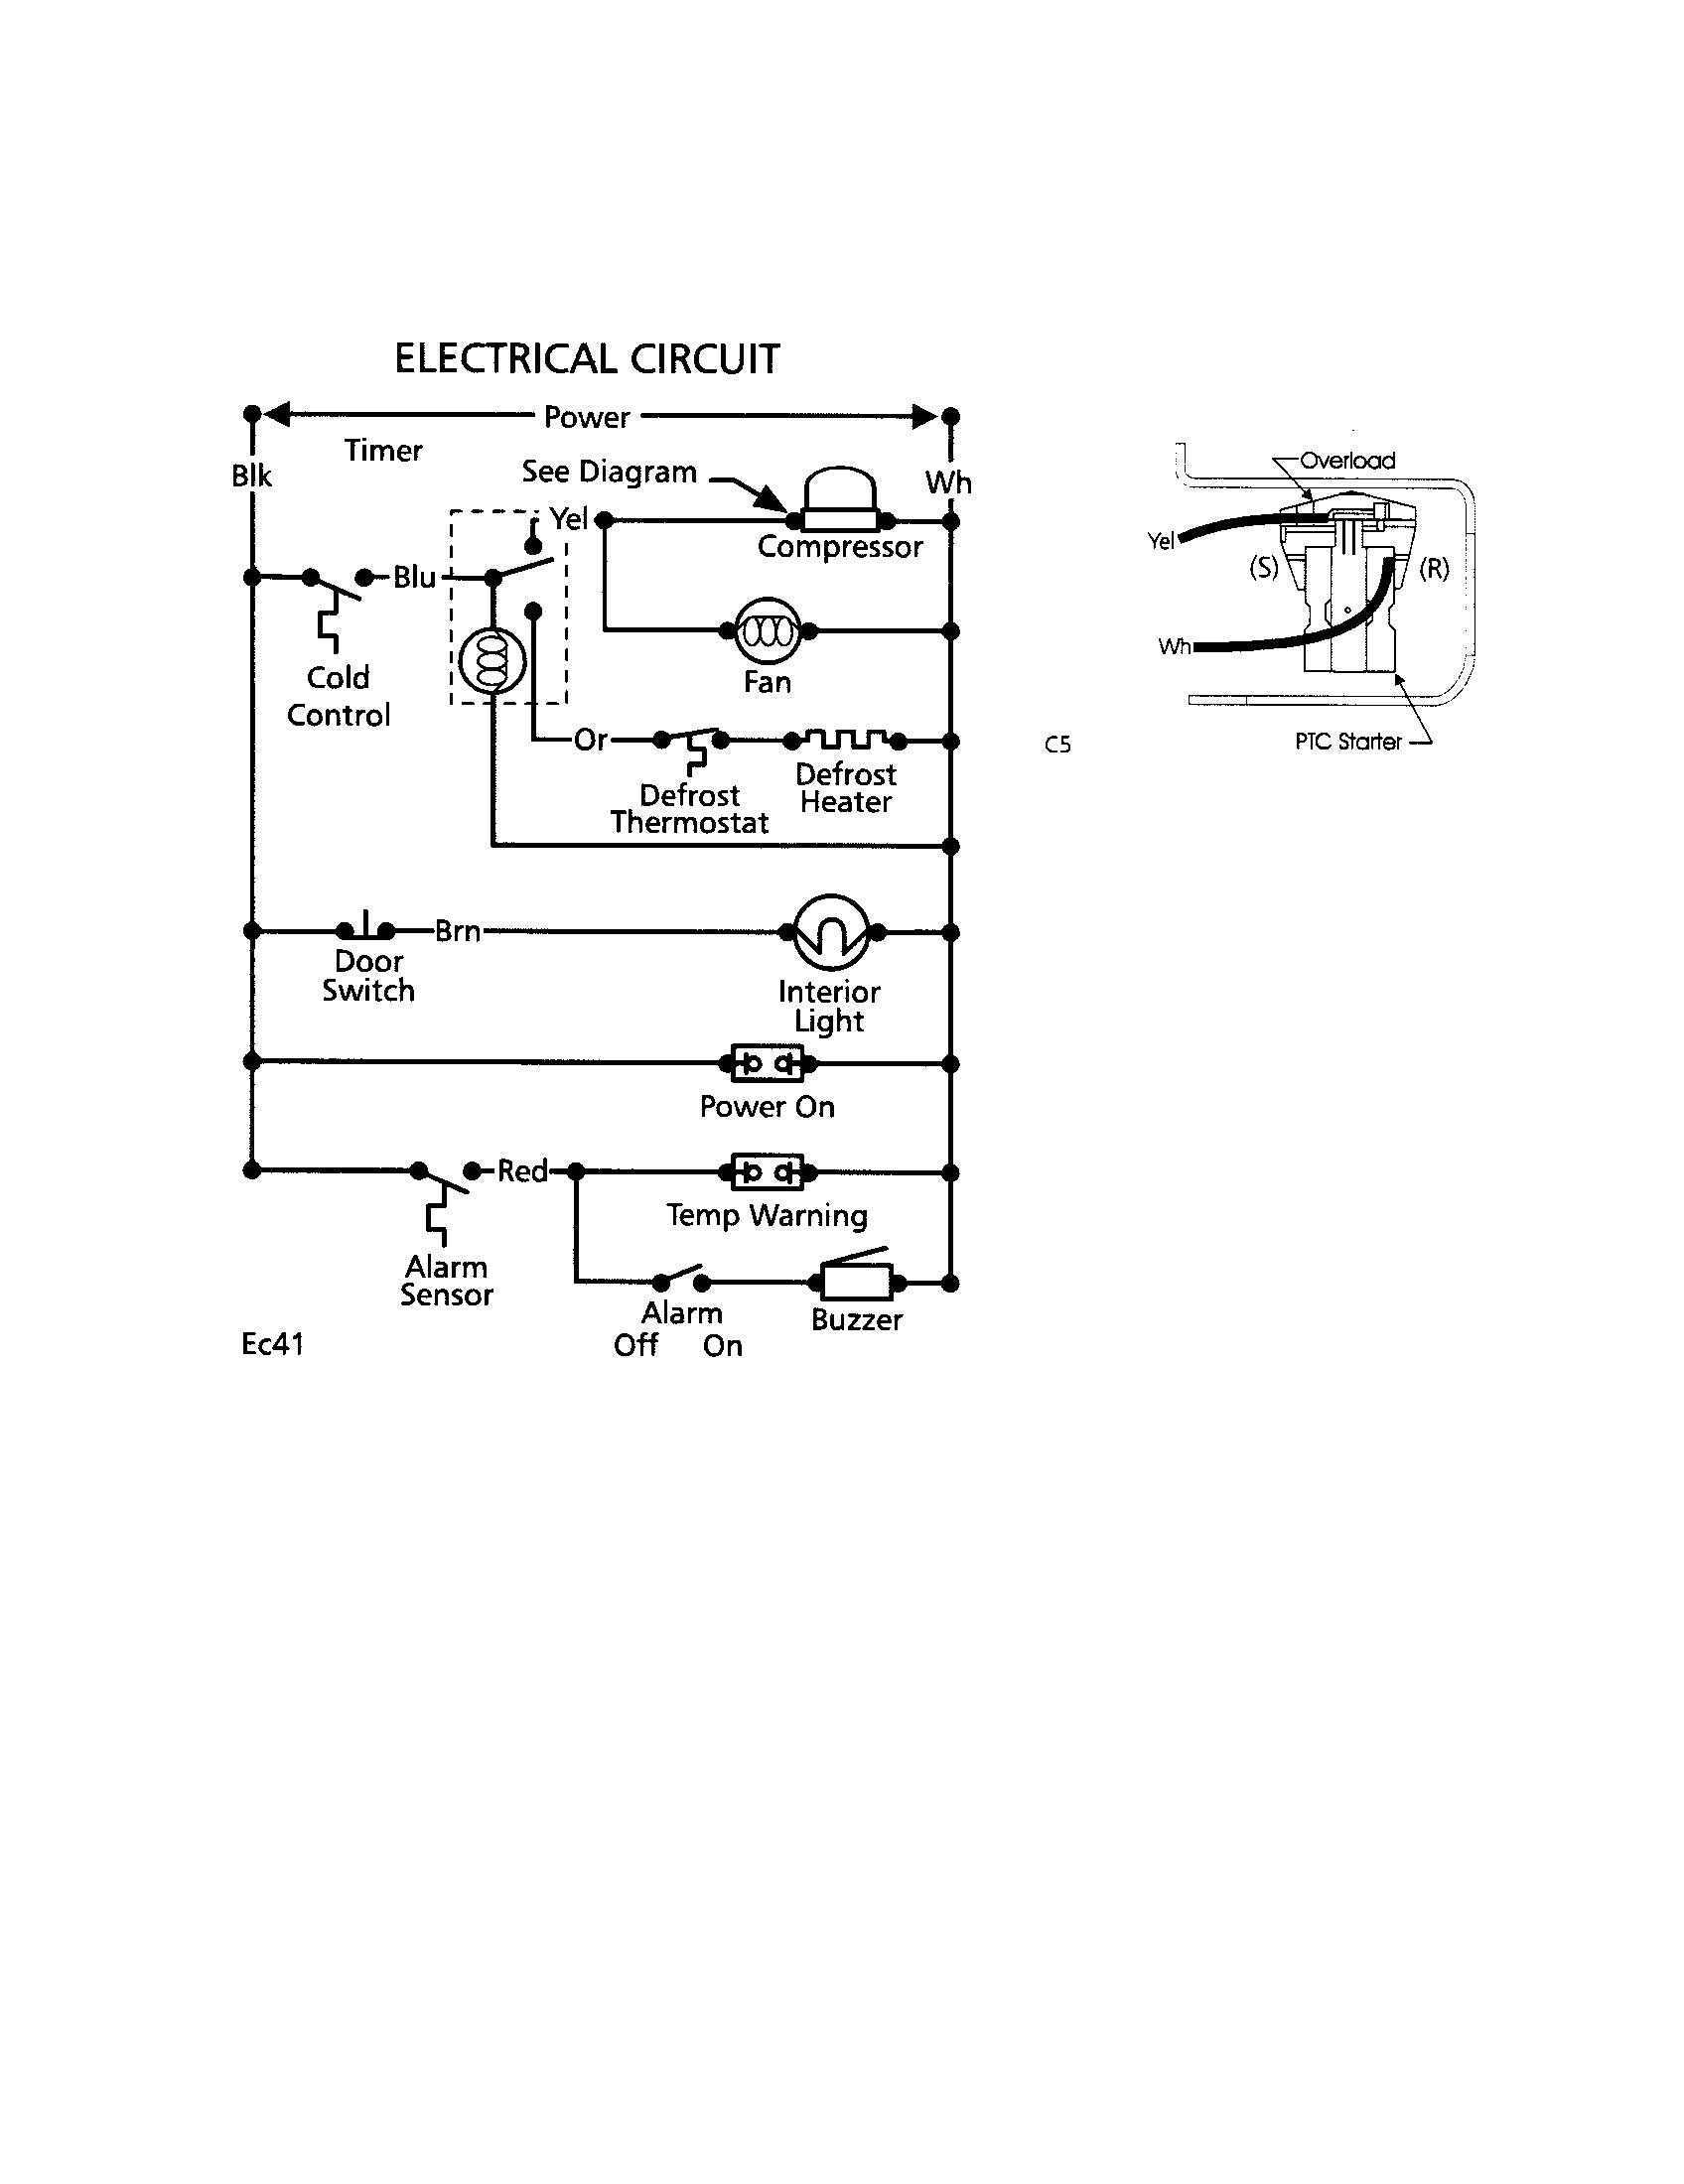 DIAGRAM] Aht232nut Traulsen Wiring Diagram FULL Version HD Quality Wiring  Diagram - MINDIAGRAM.HELENE-COIFFURE-ROUEN.FRDiagram Database